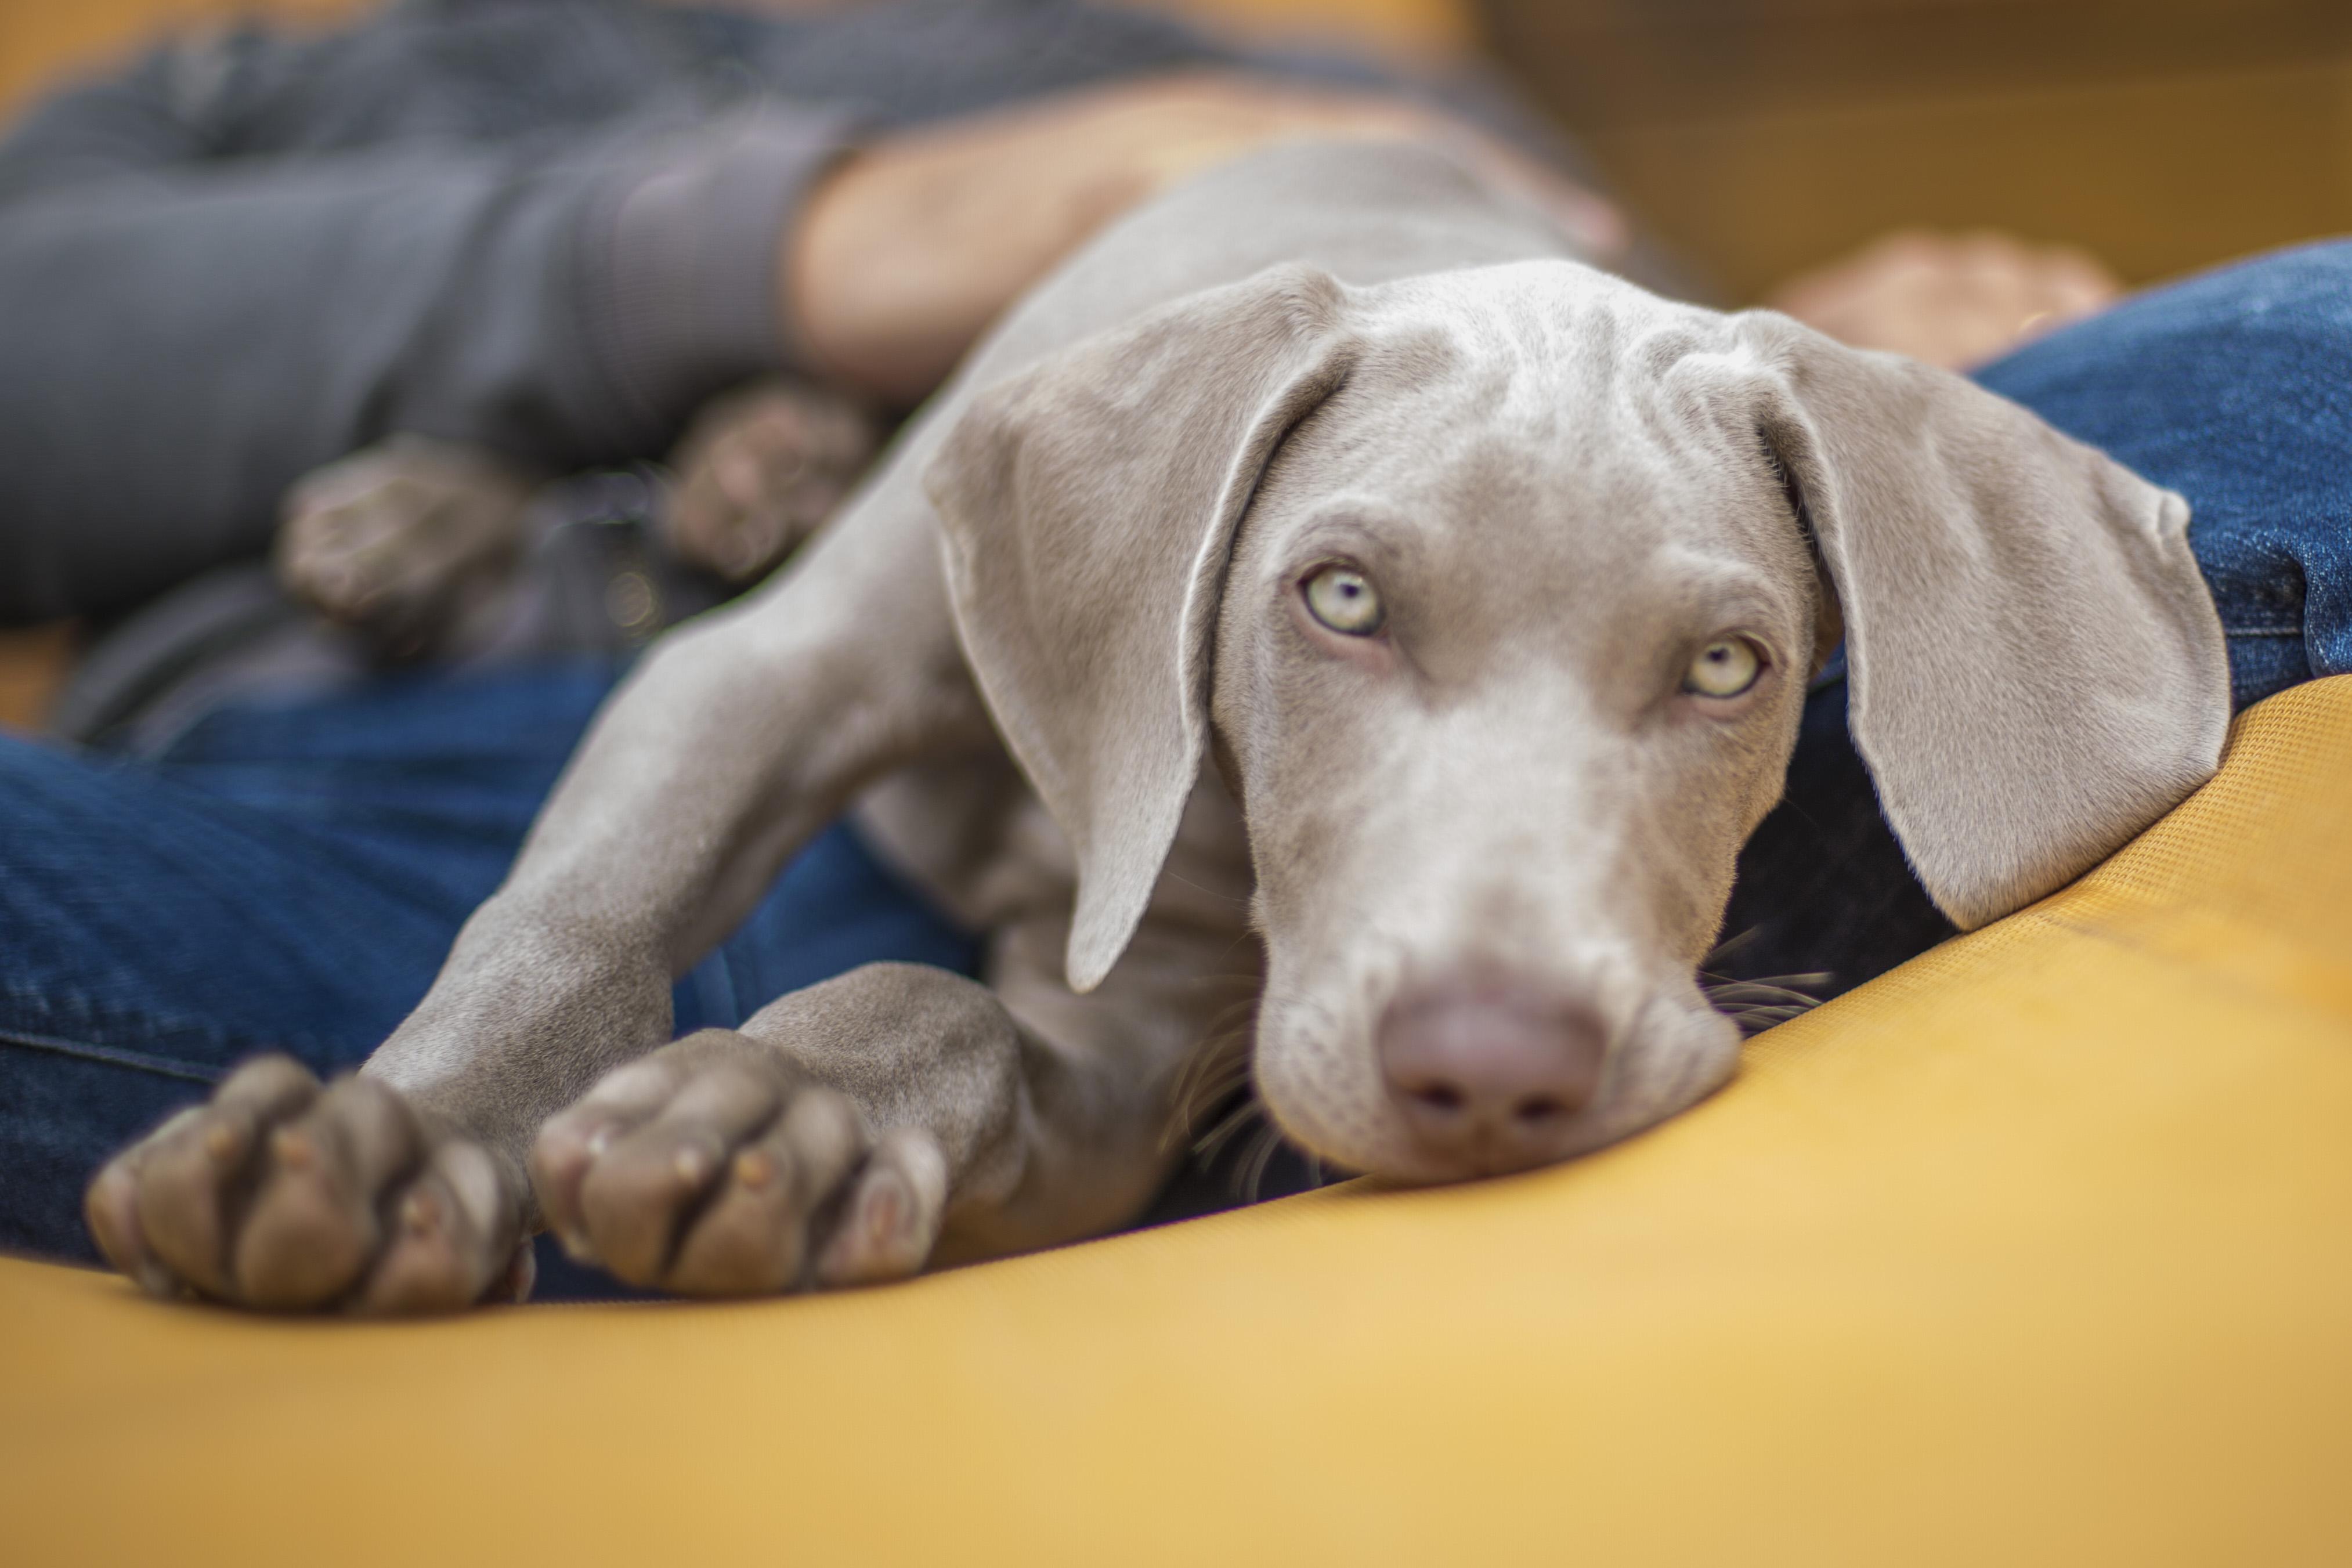 Pet photography. Primo piano di un cane Weimaraner. Foto di Luca Finessi.